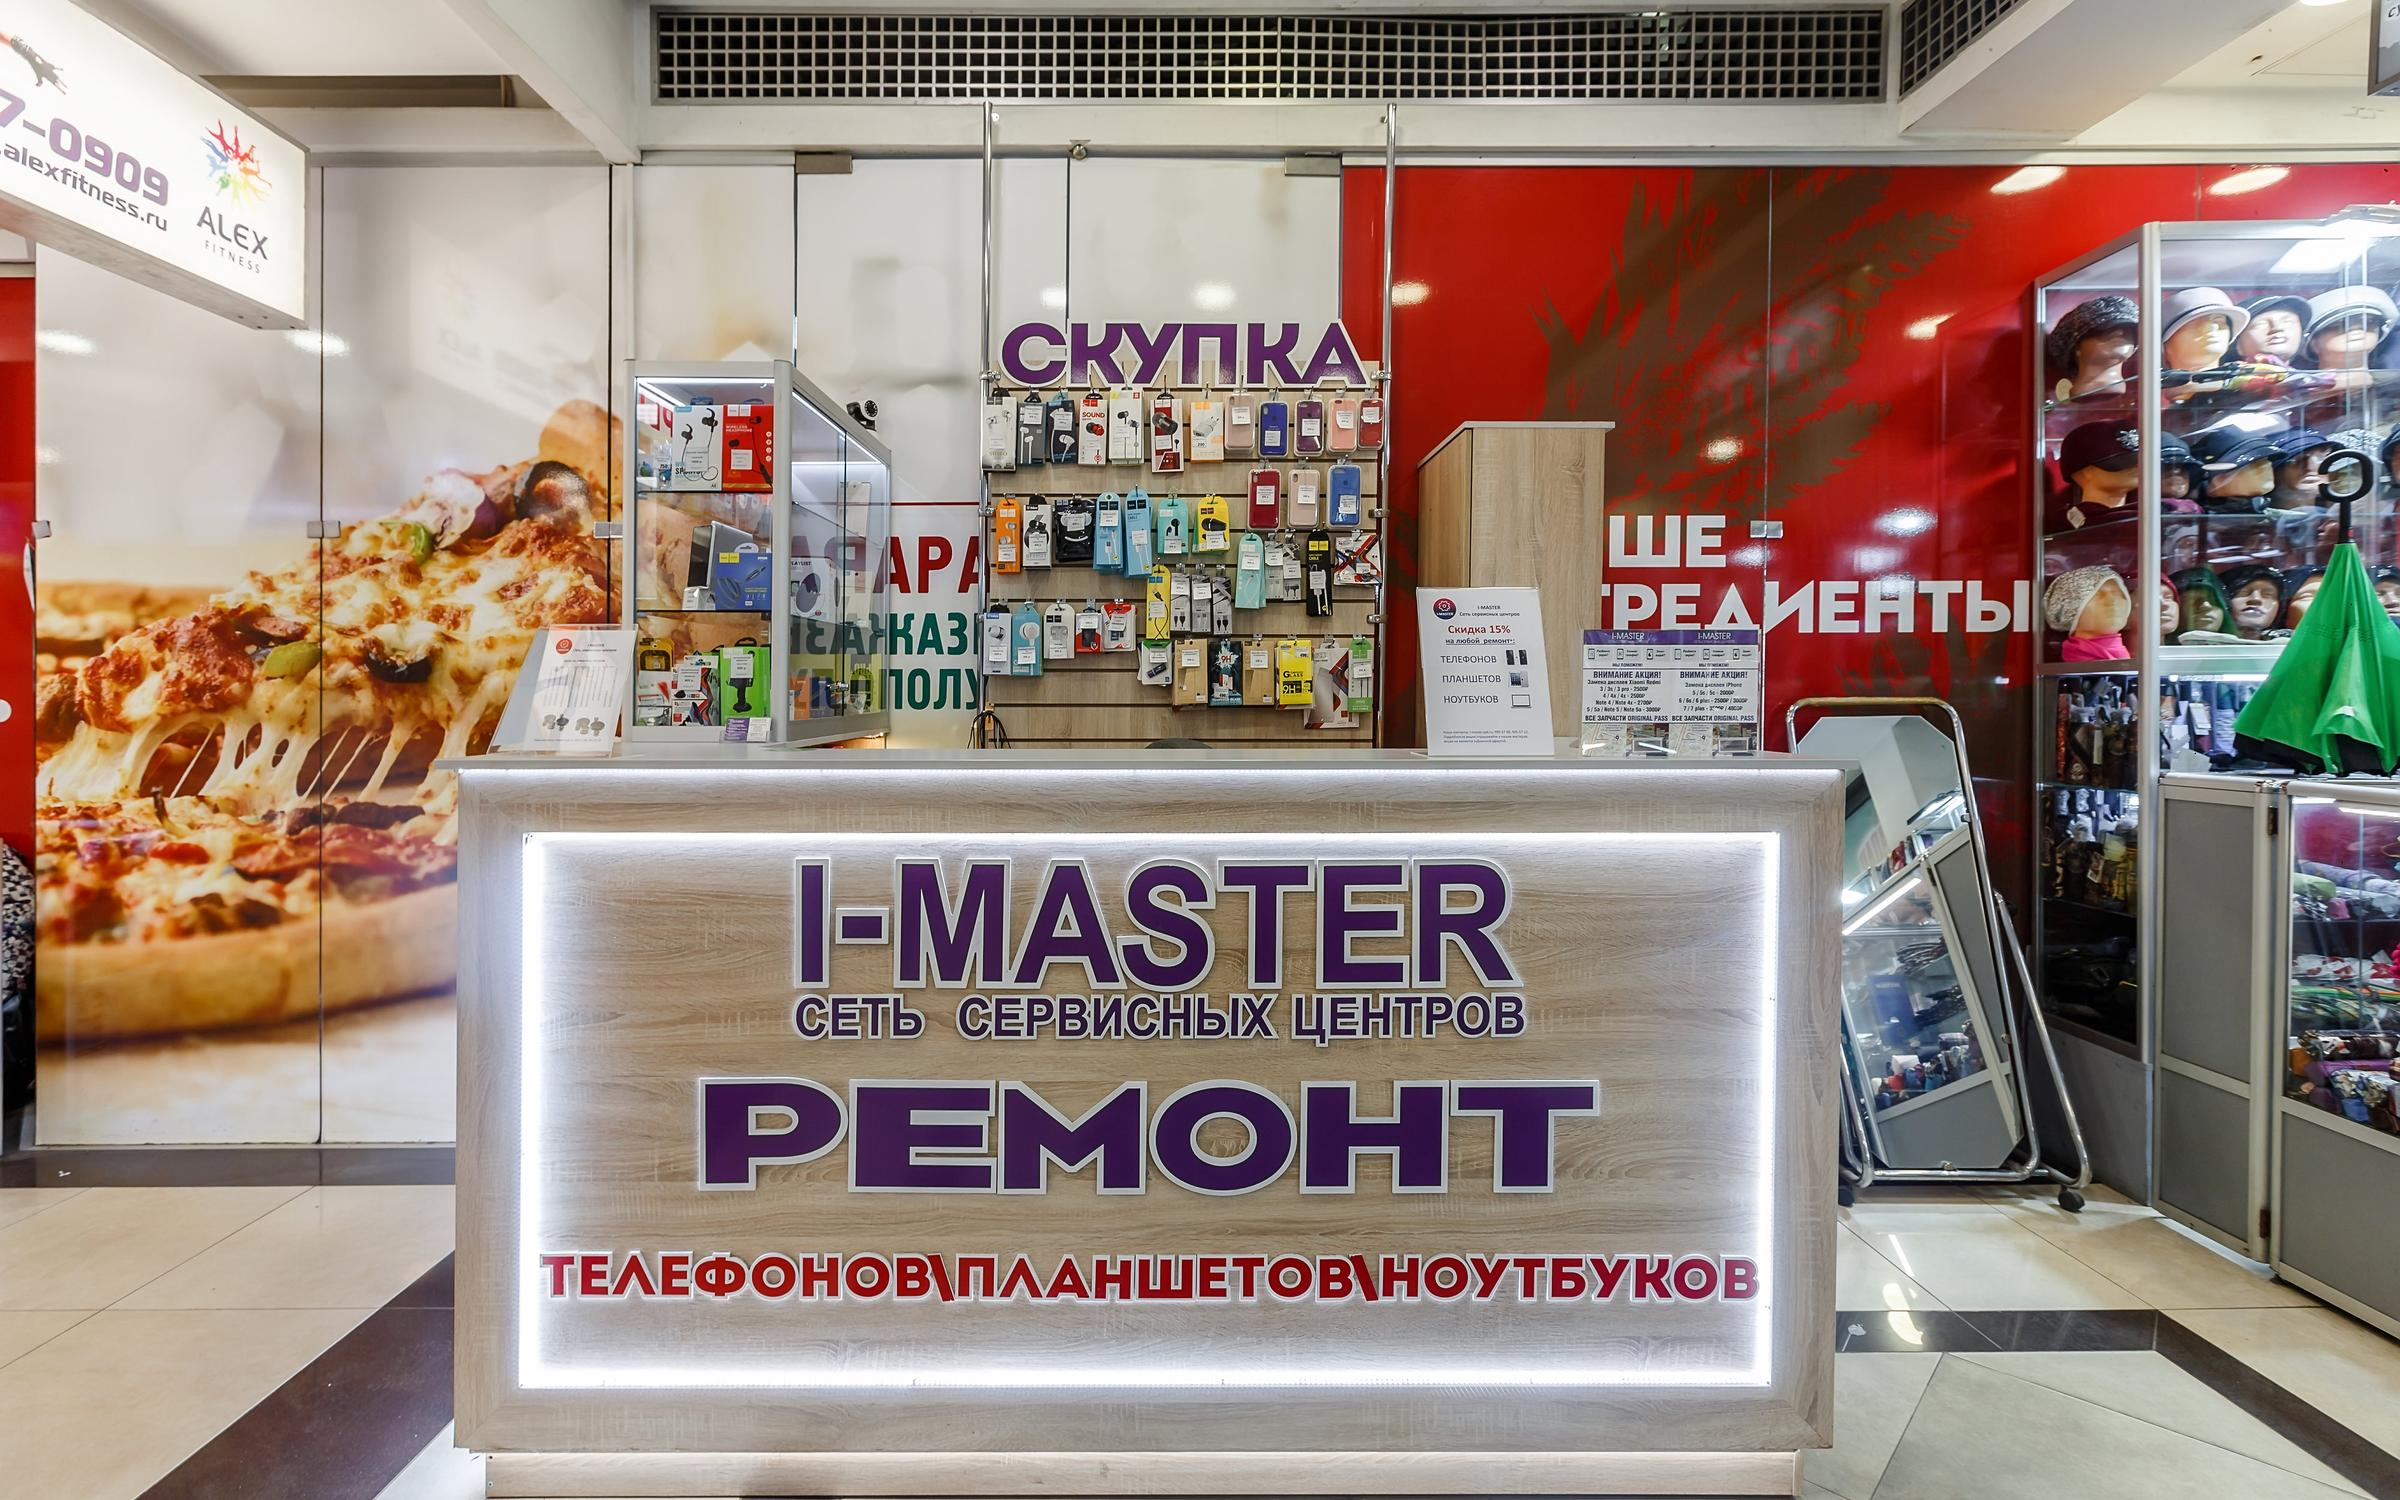 фотография Сервисного центра I-Master в ТЦ Платформа